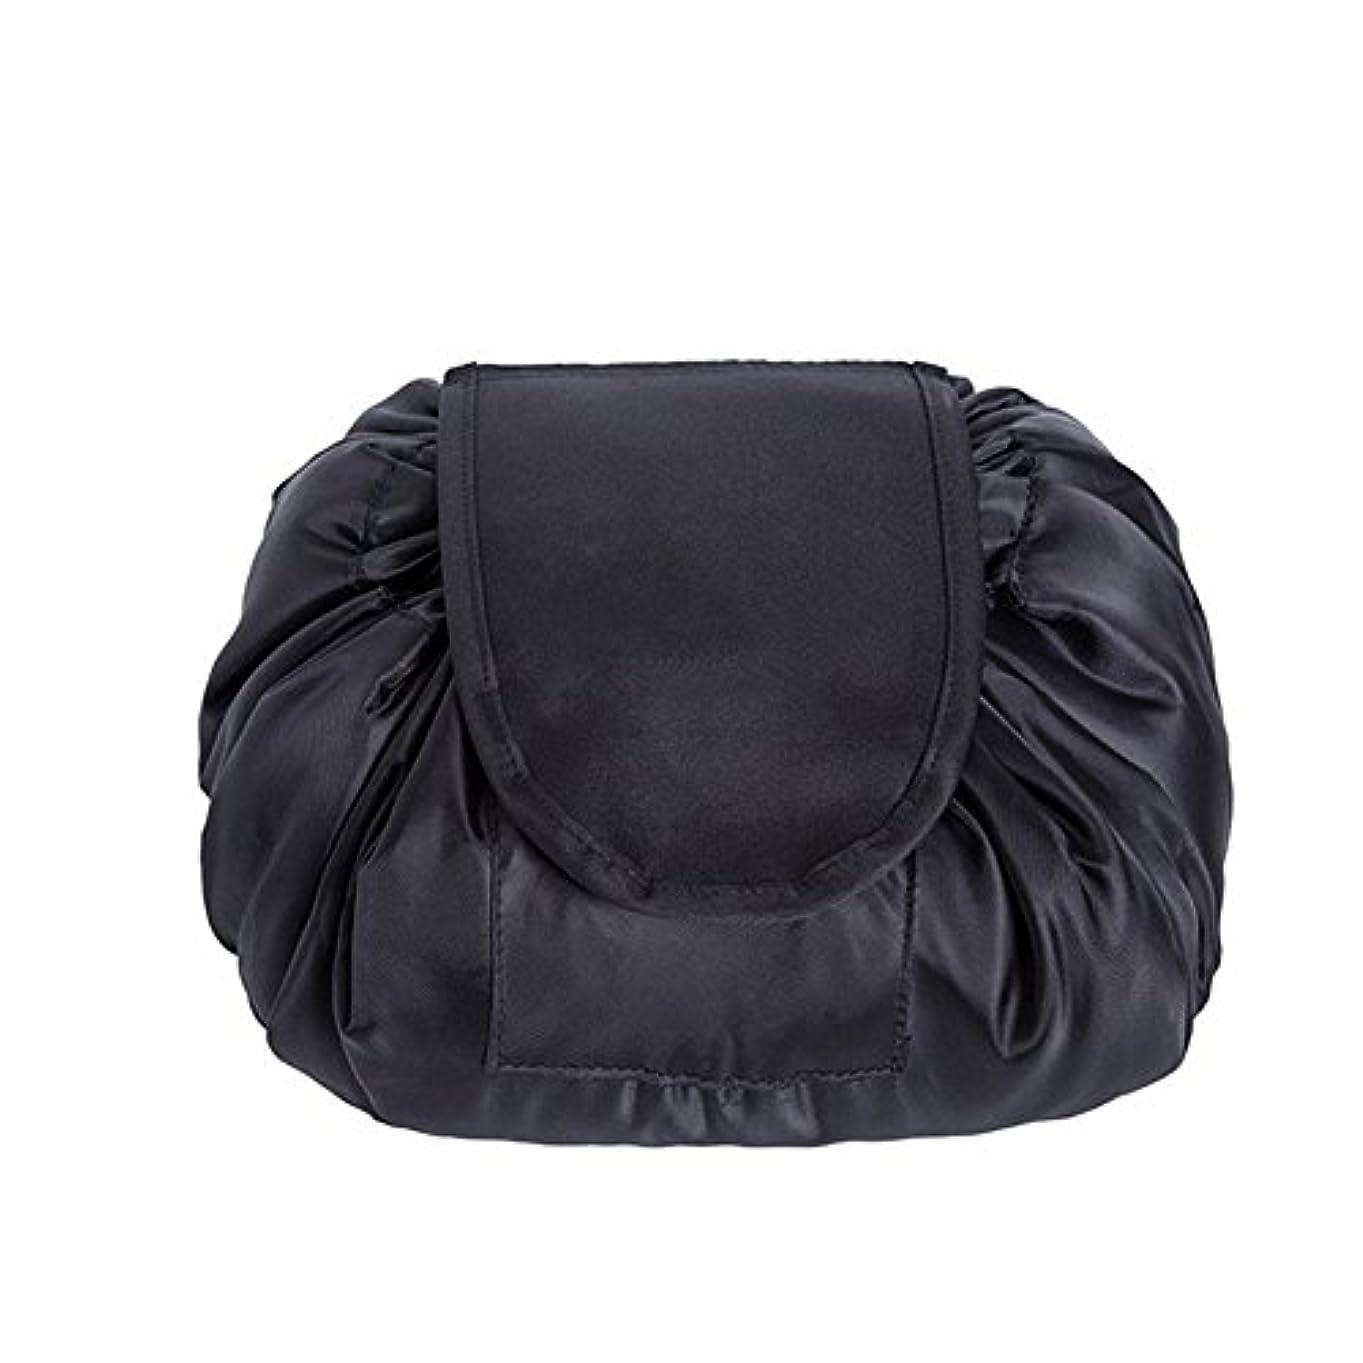 SimonJp メイクポーチ 化粧ポーチ 化粧品収納 収納ポーチ 多機能 大容量 巾着袋 防水 携帯 軽量 旅行 便利 ブラック